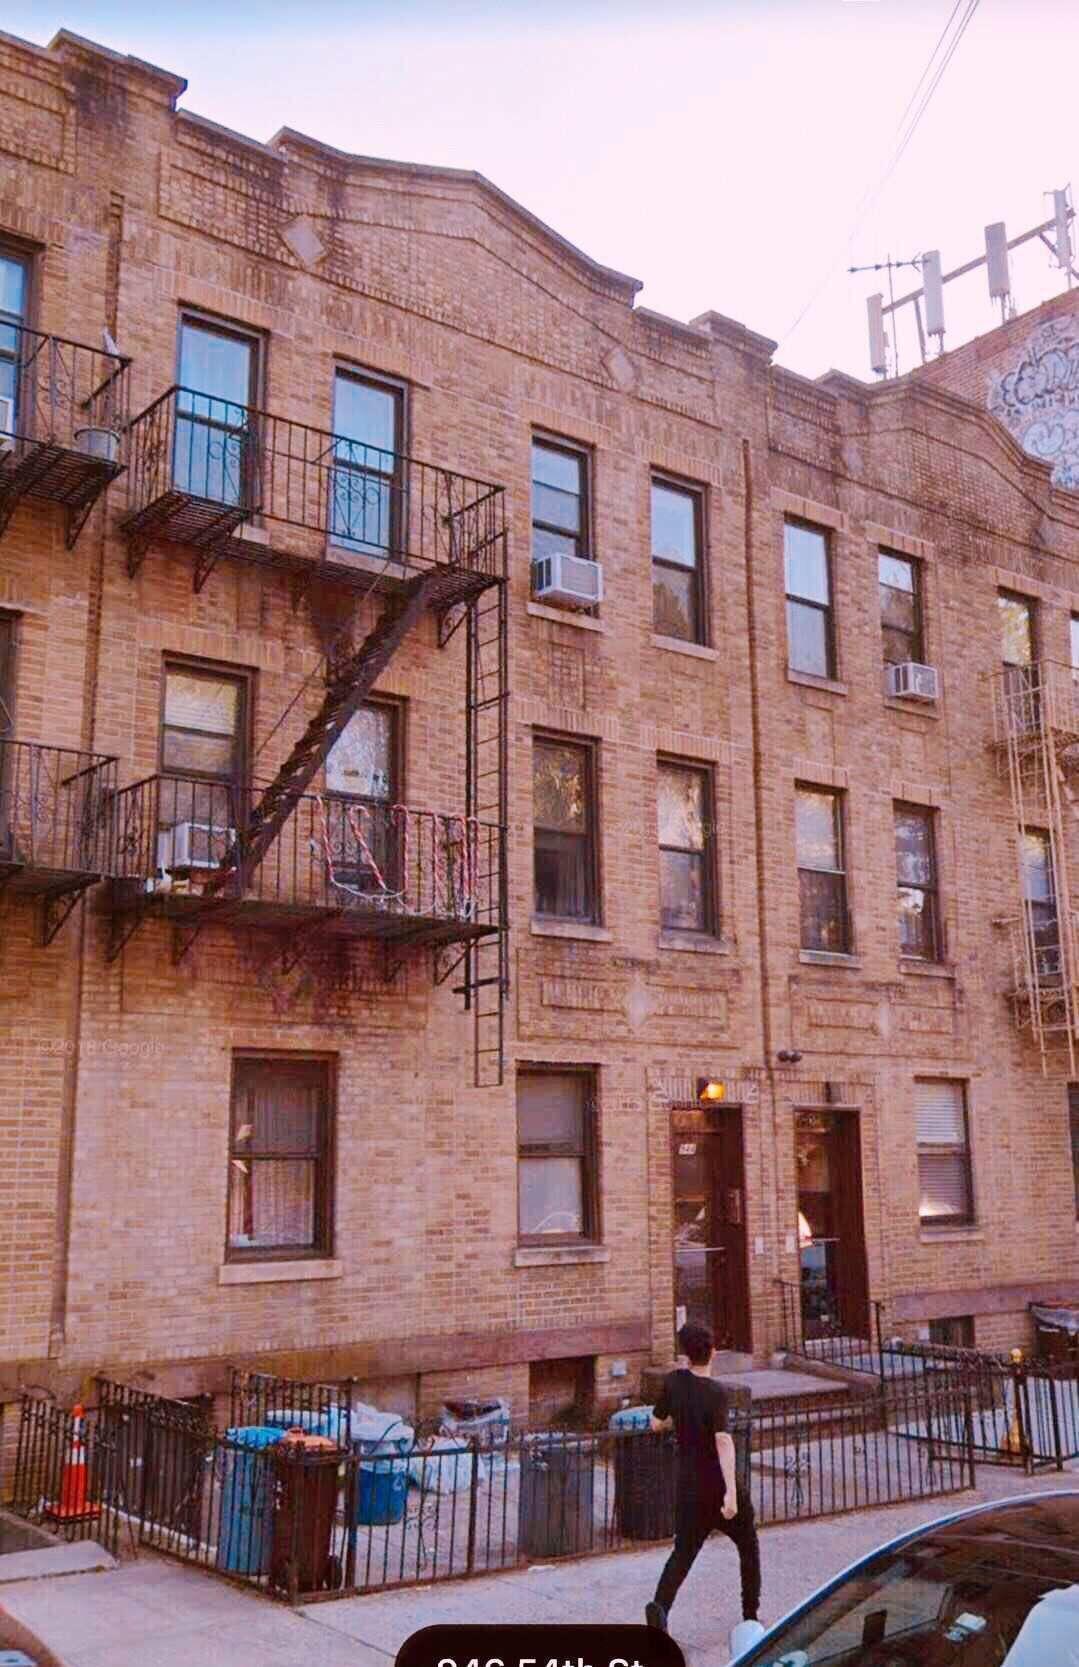 944 54th St. 特大6家庭相连砖屋出售。三层加半土库。